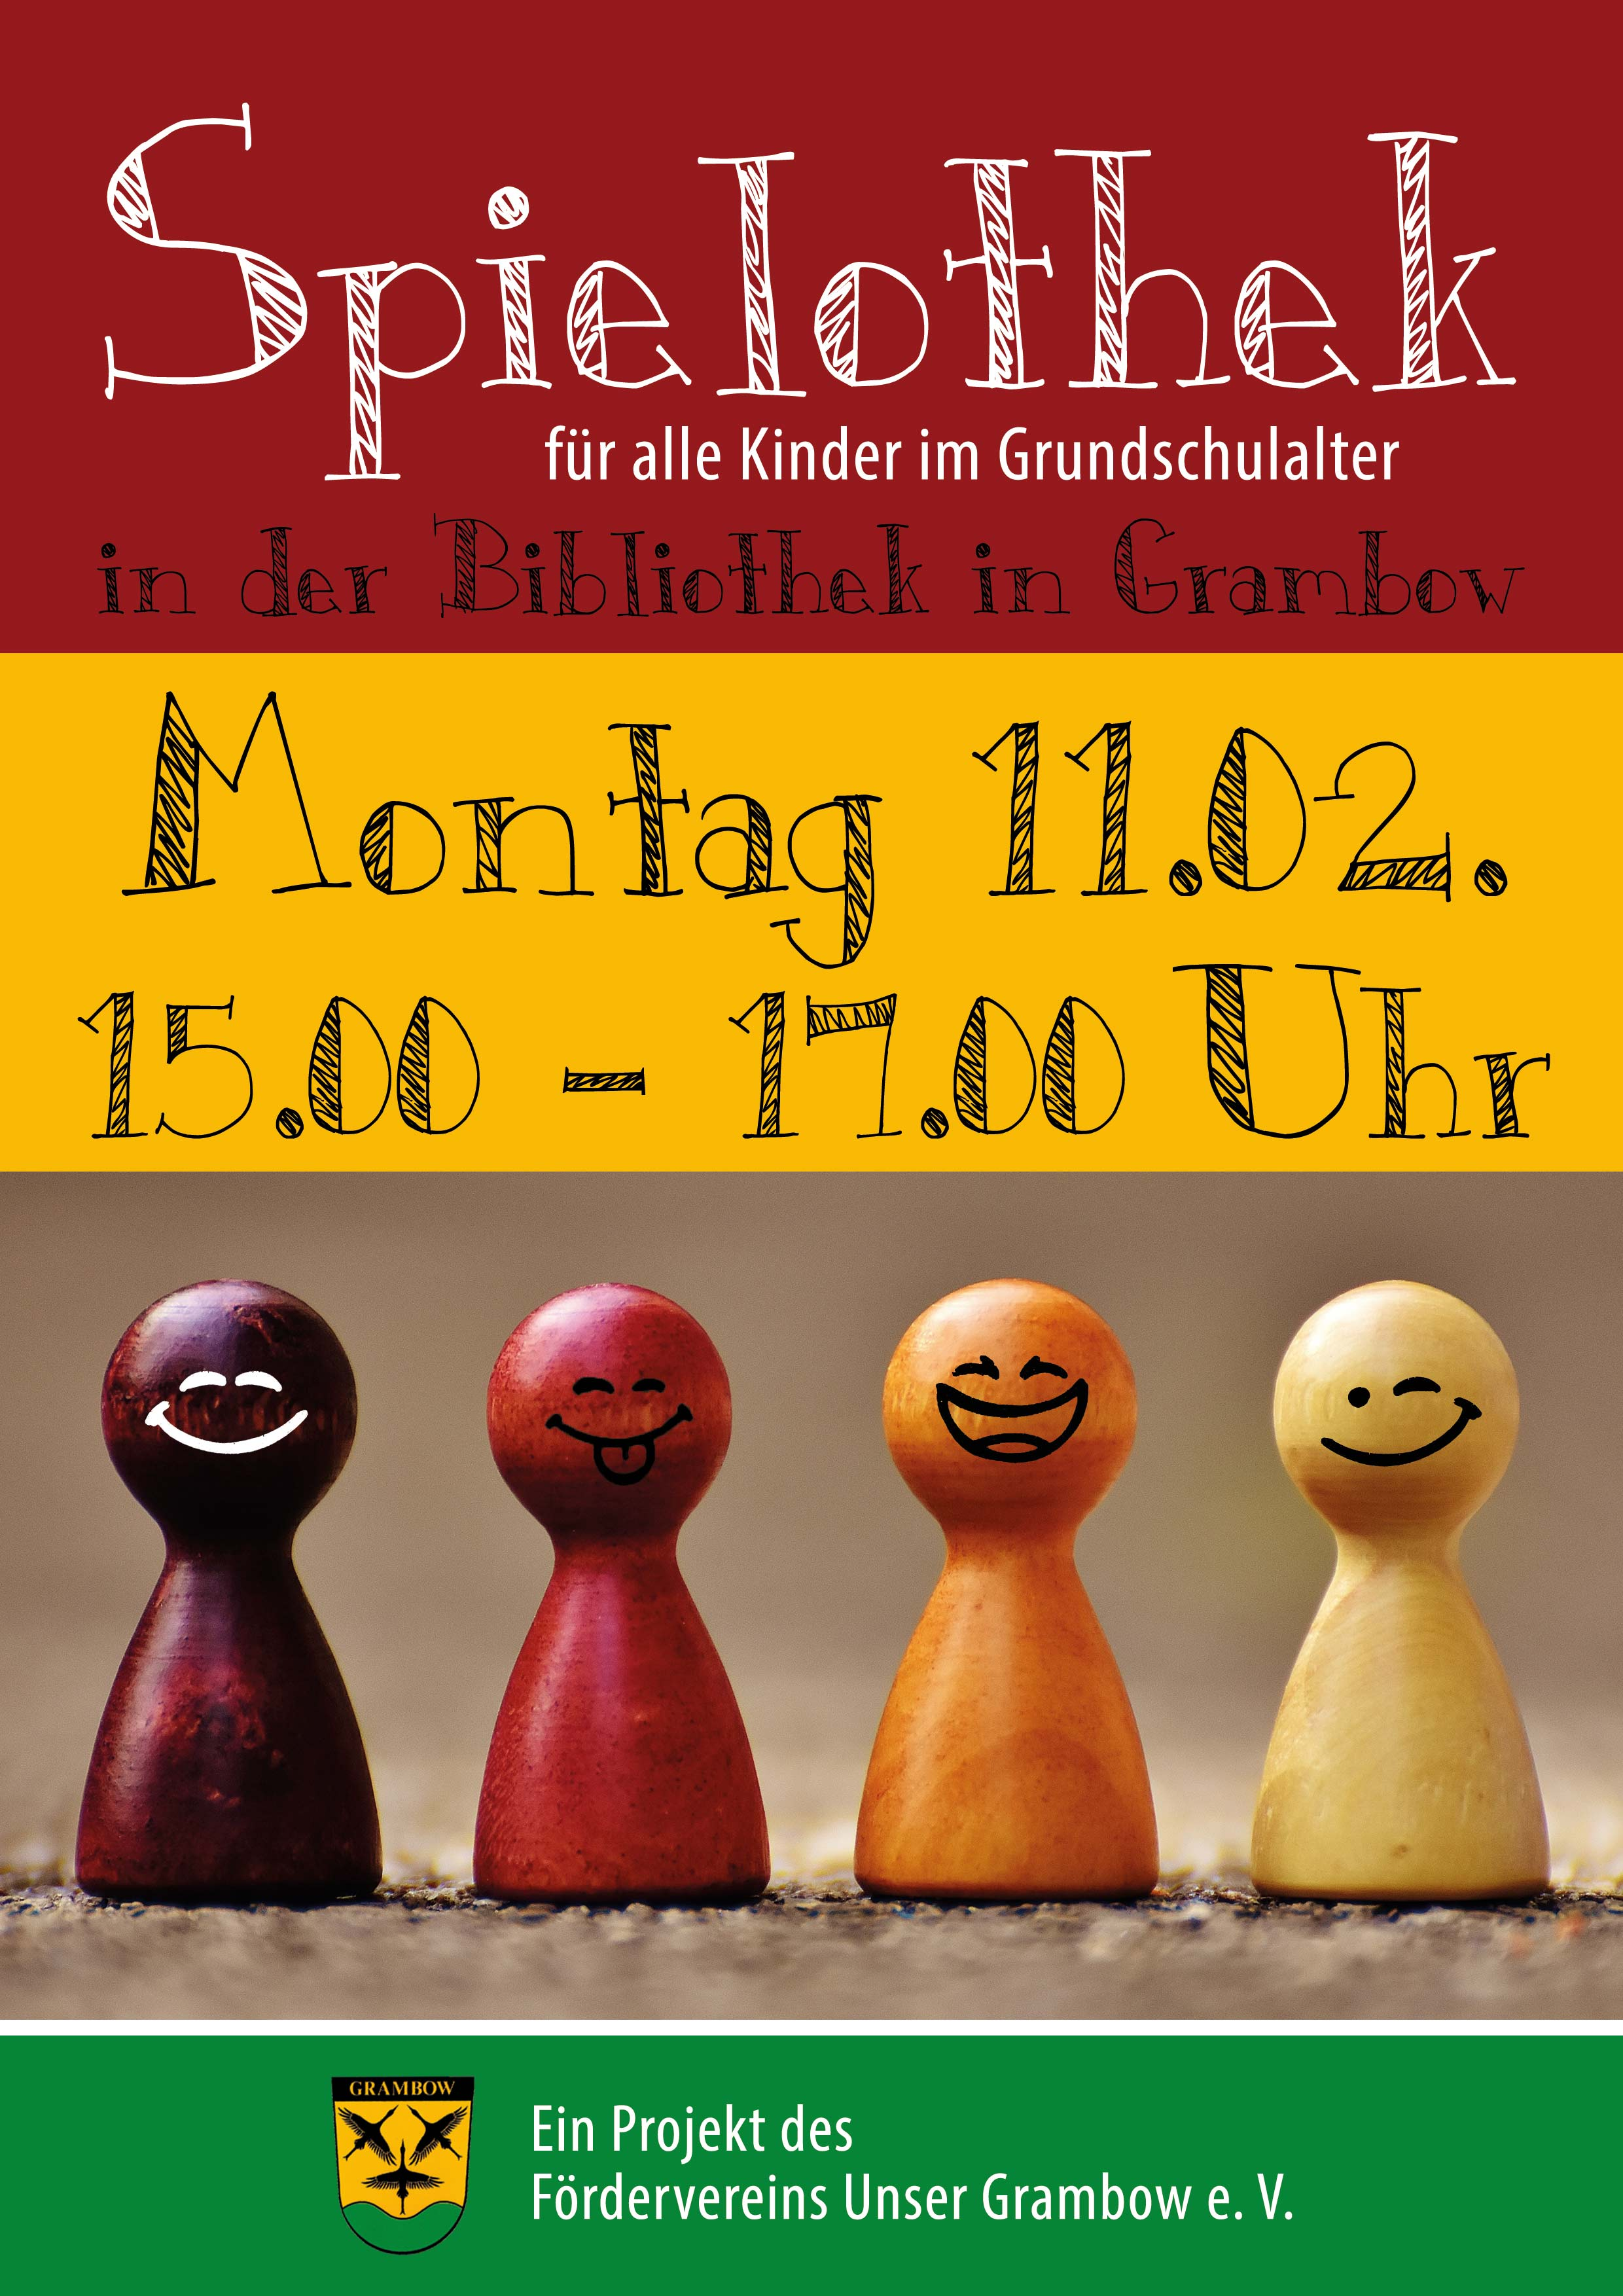 Plakat-Spielothek12 (1)